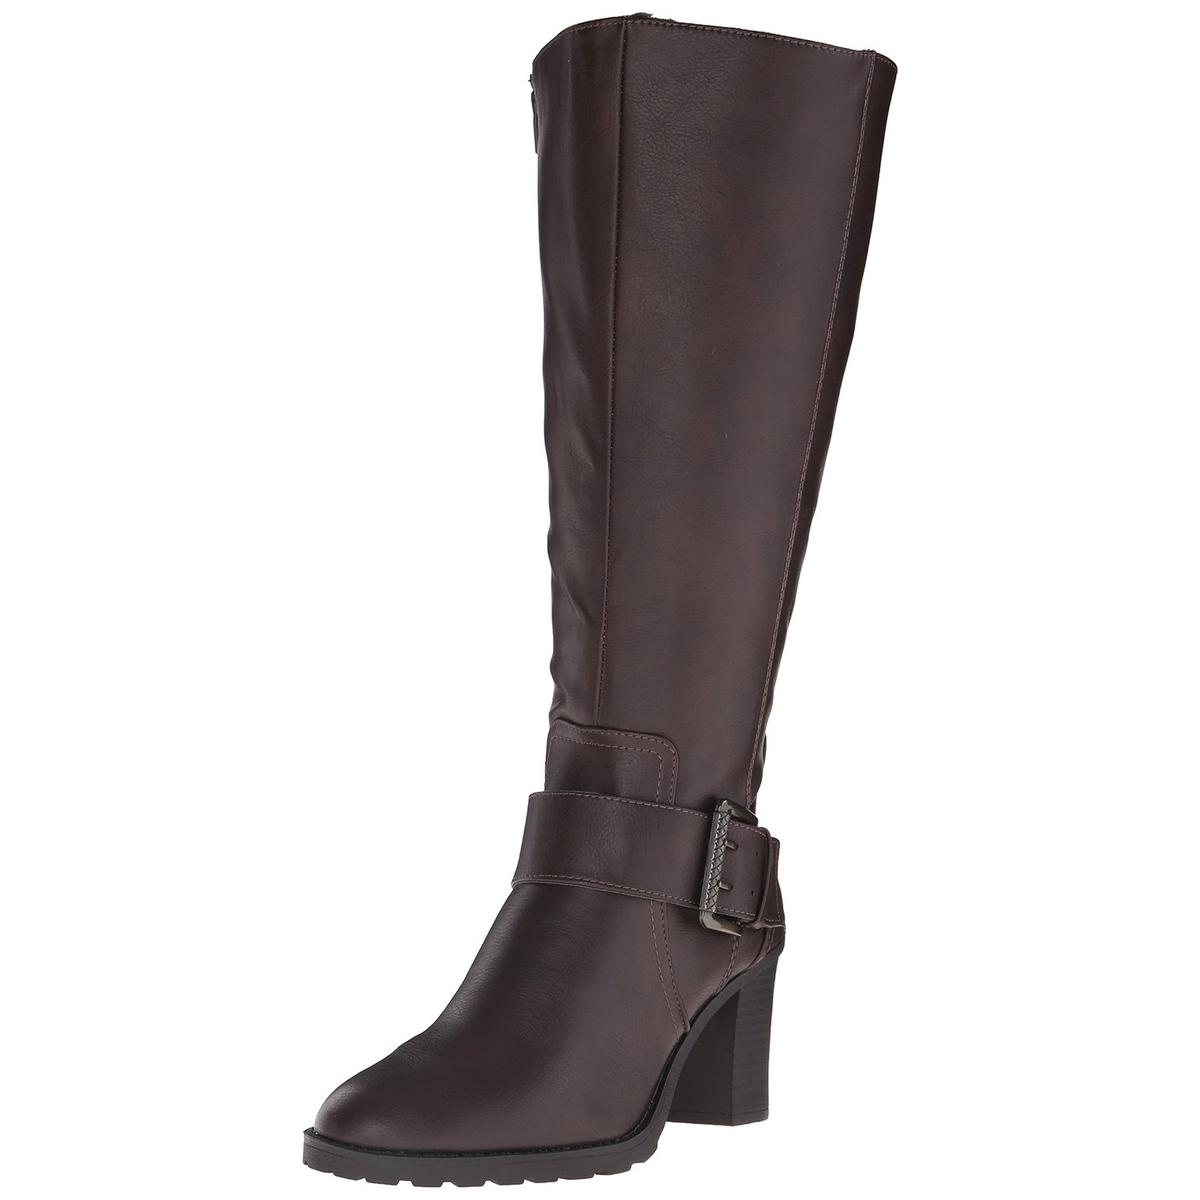 Lifestride Sasha Womens Dark Chocolate Boots by LifeStride